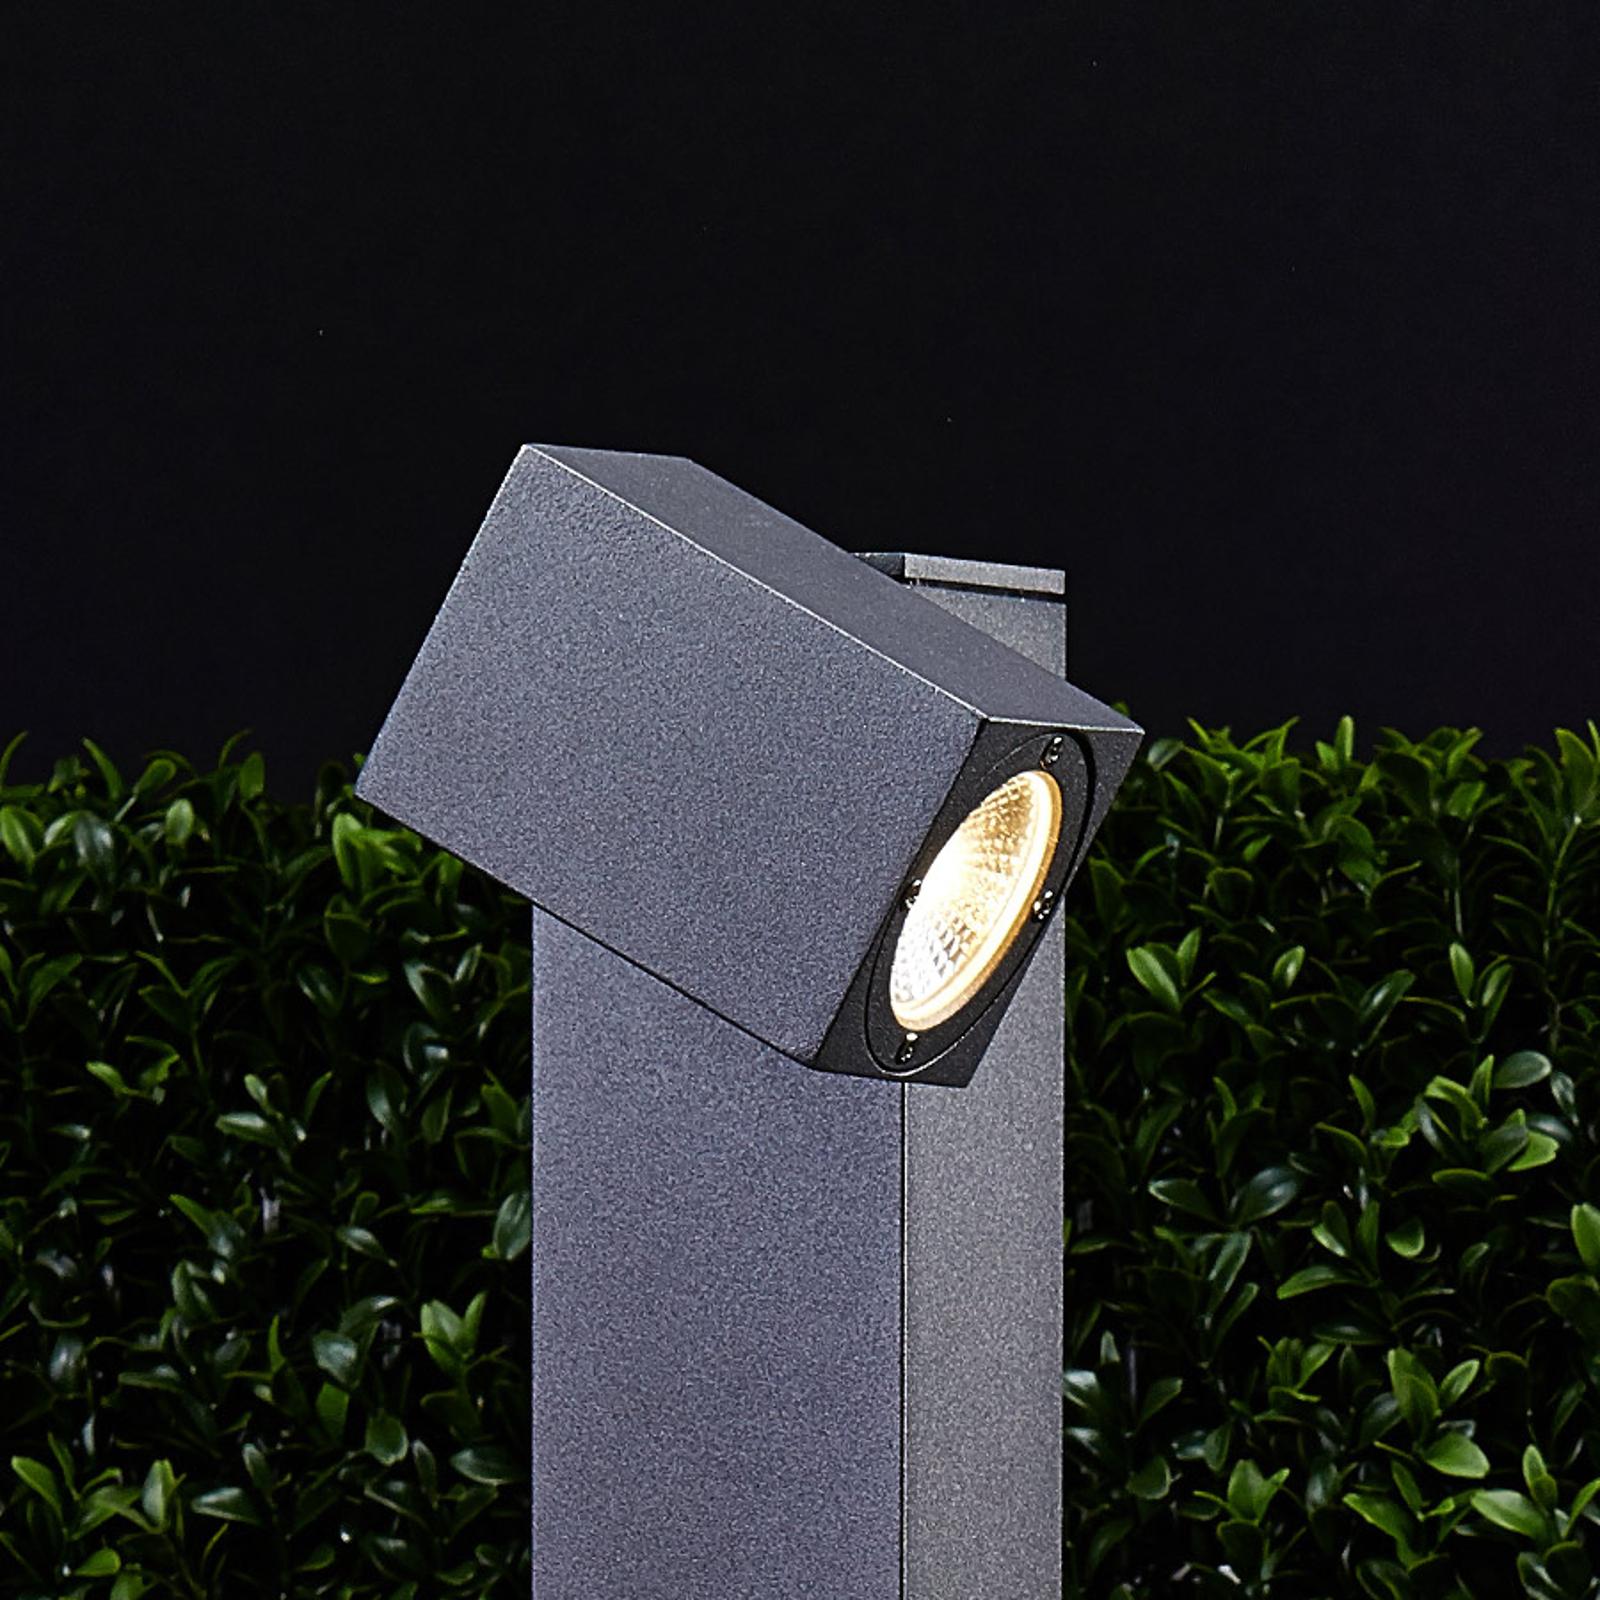 Słupek oświetleniowy LED Lorik